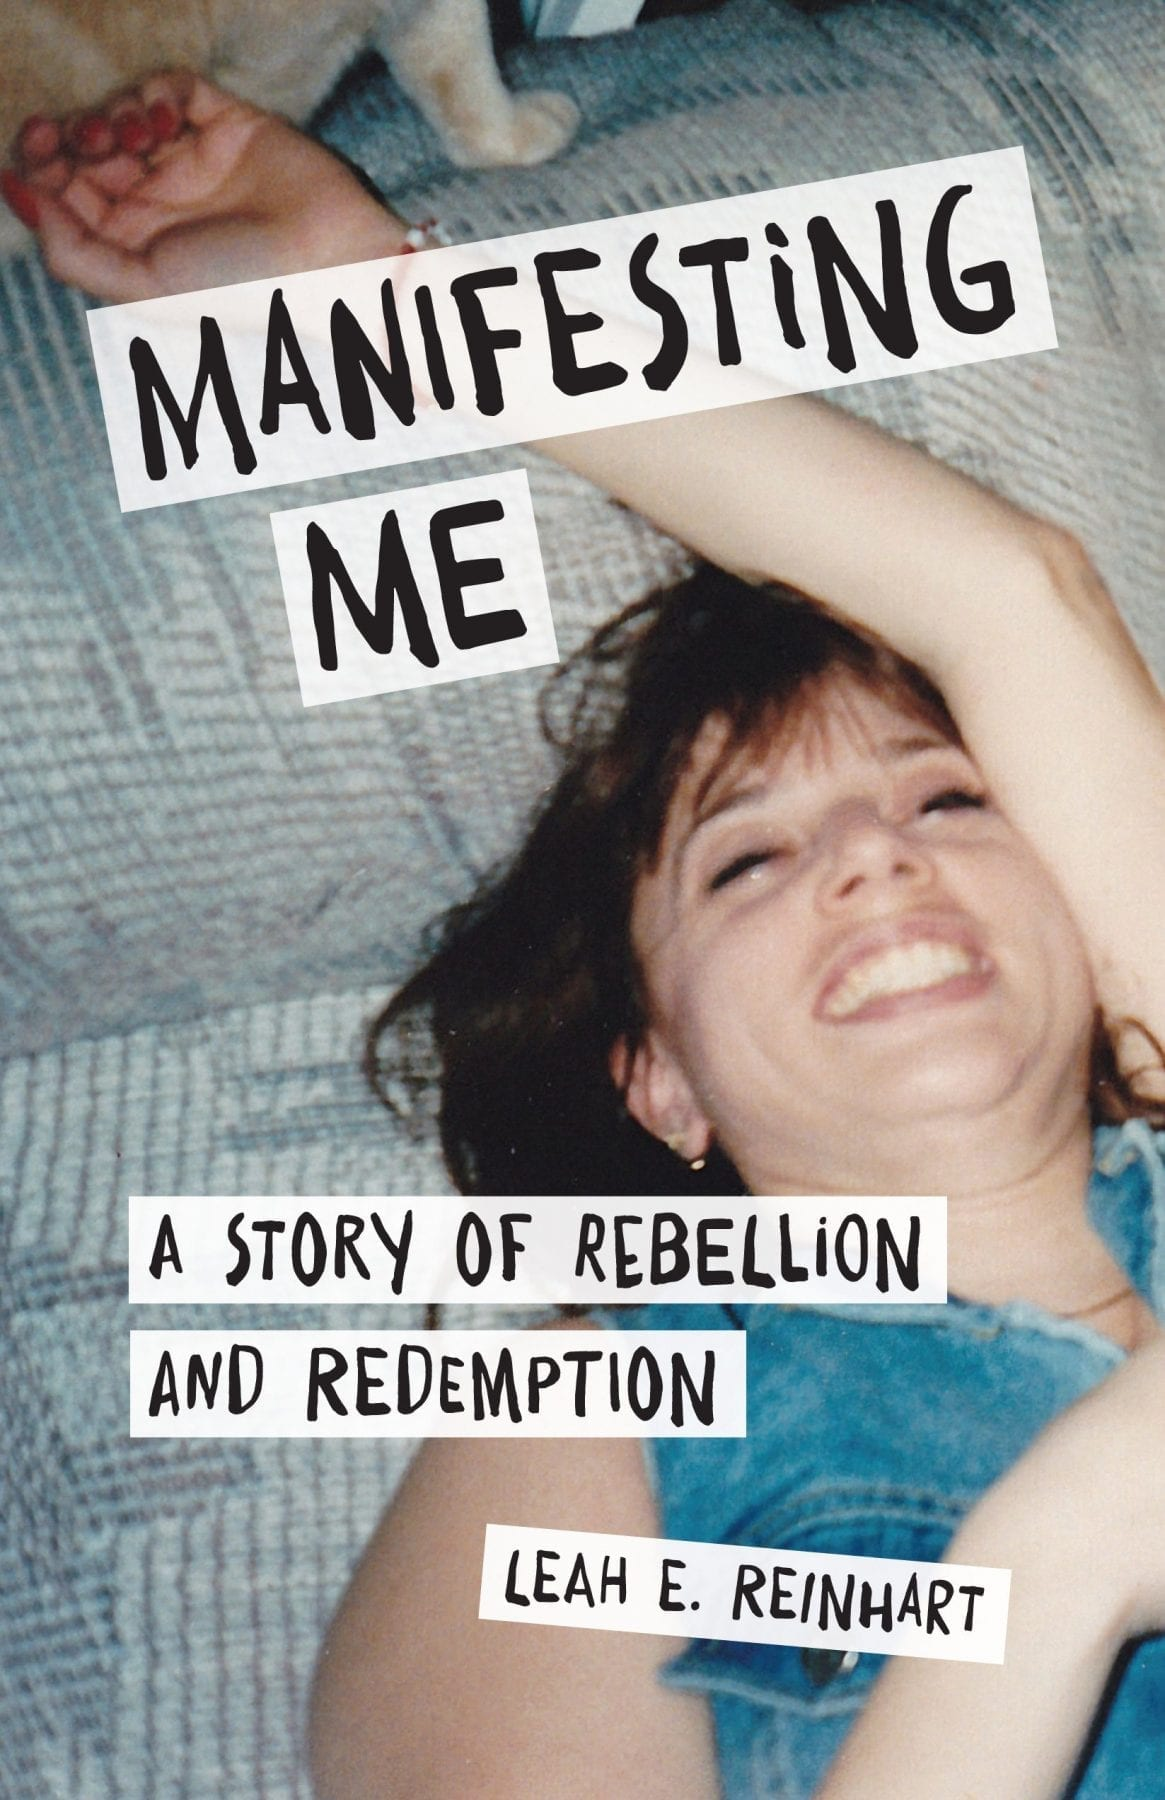 Manifesting Me by Leah E. Reinhart